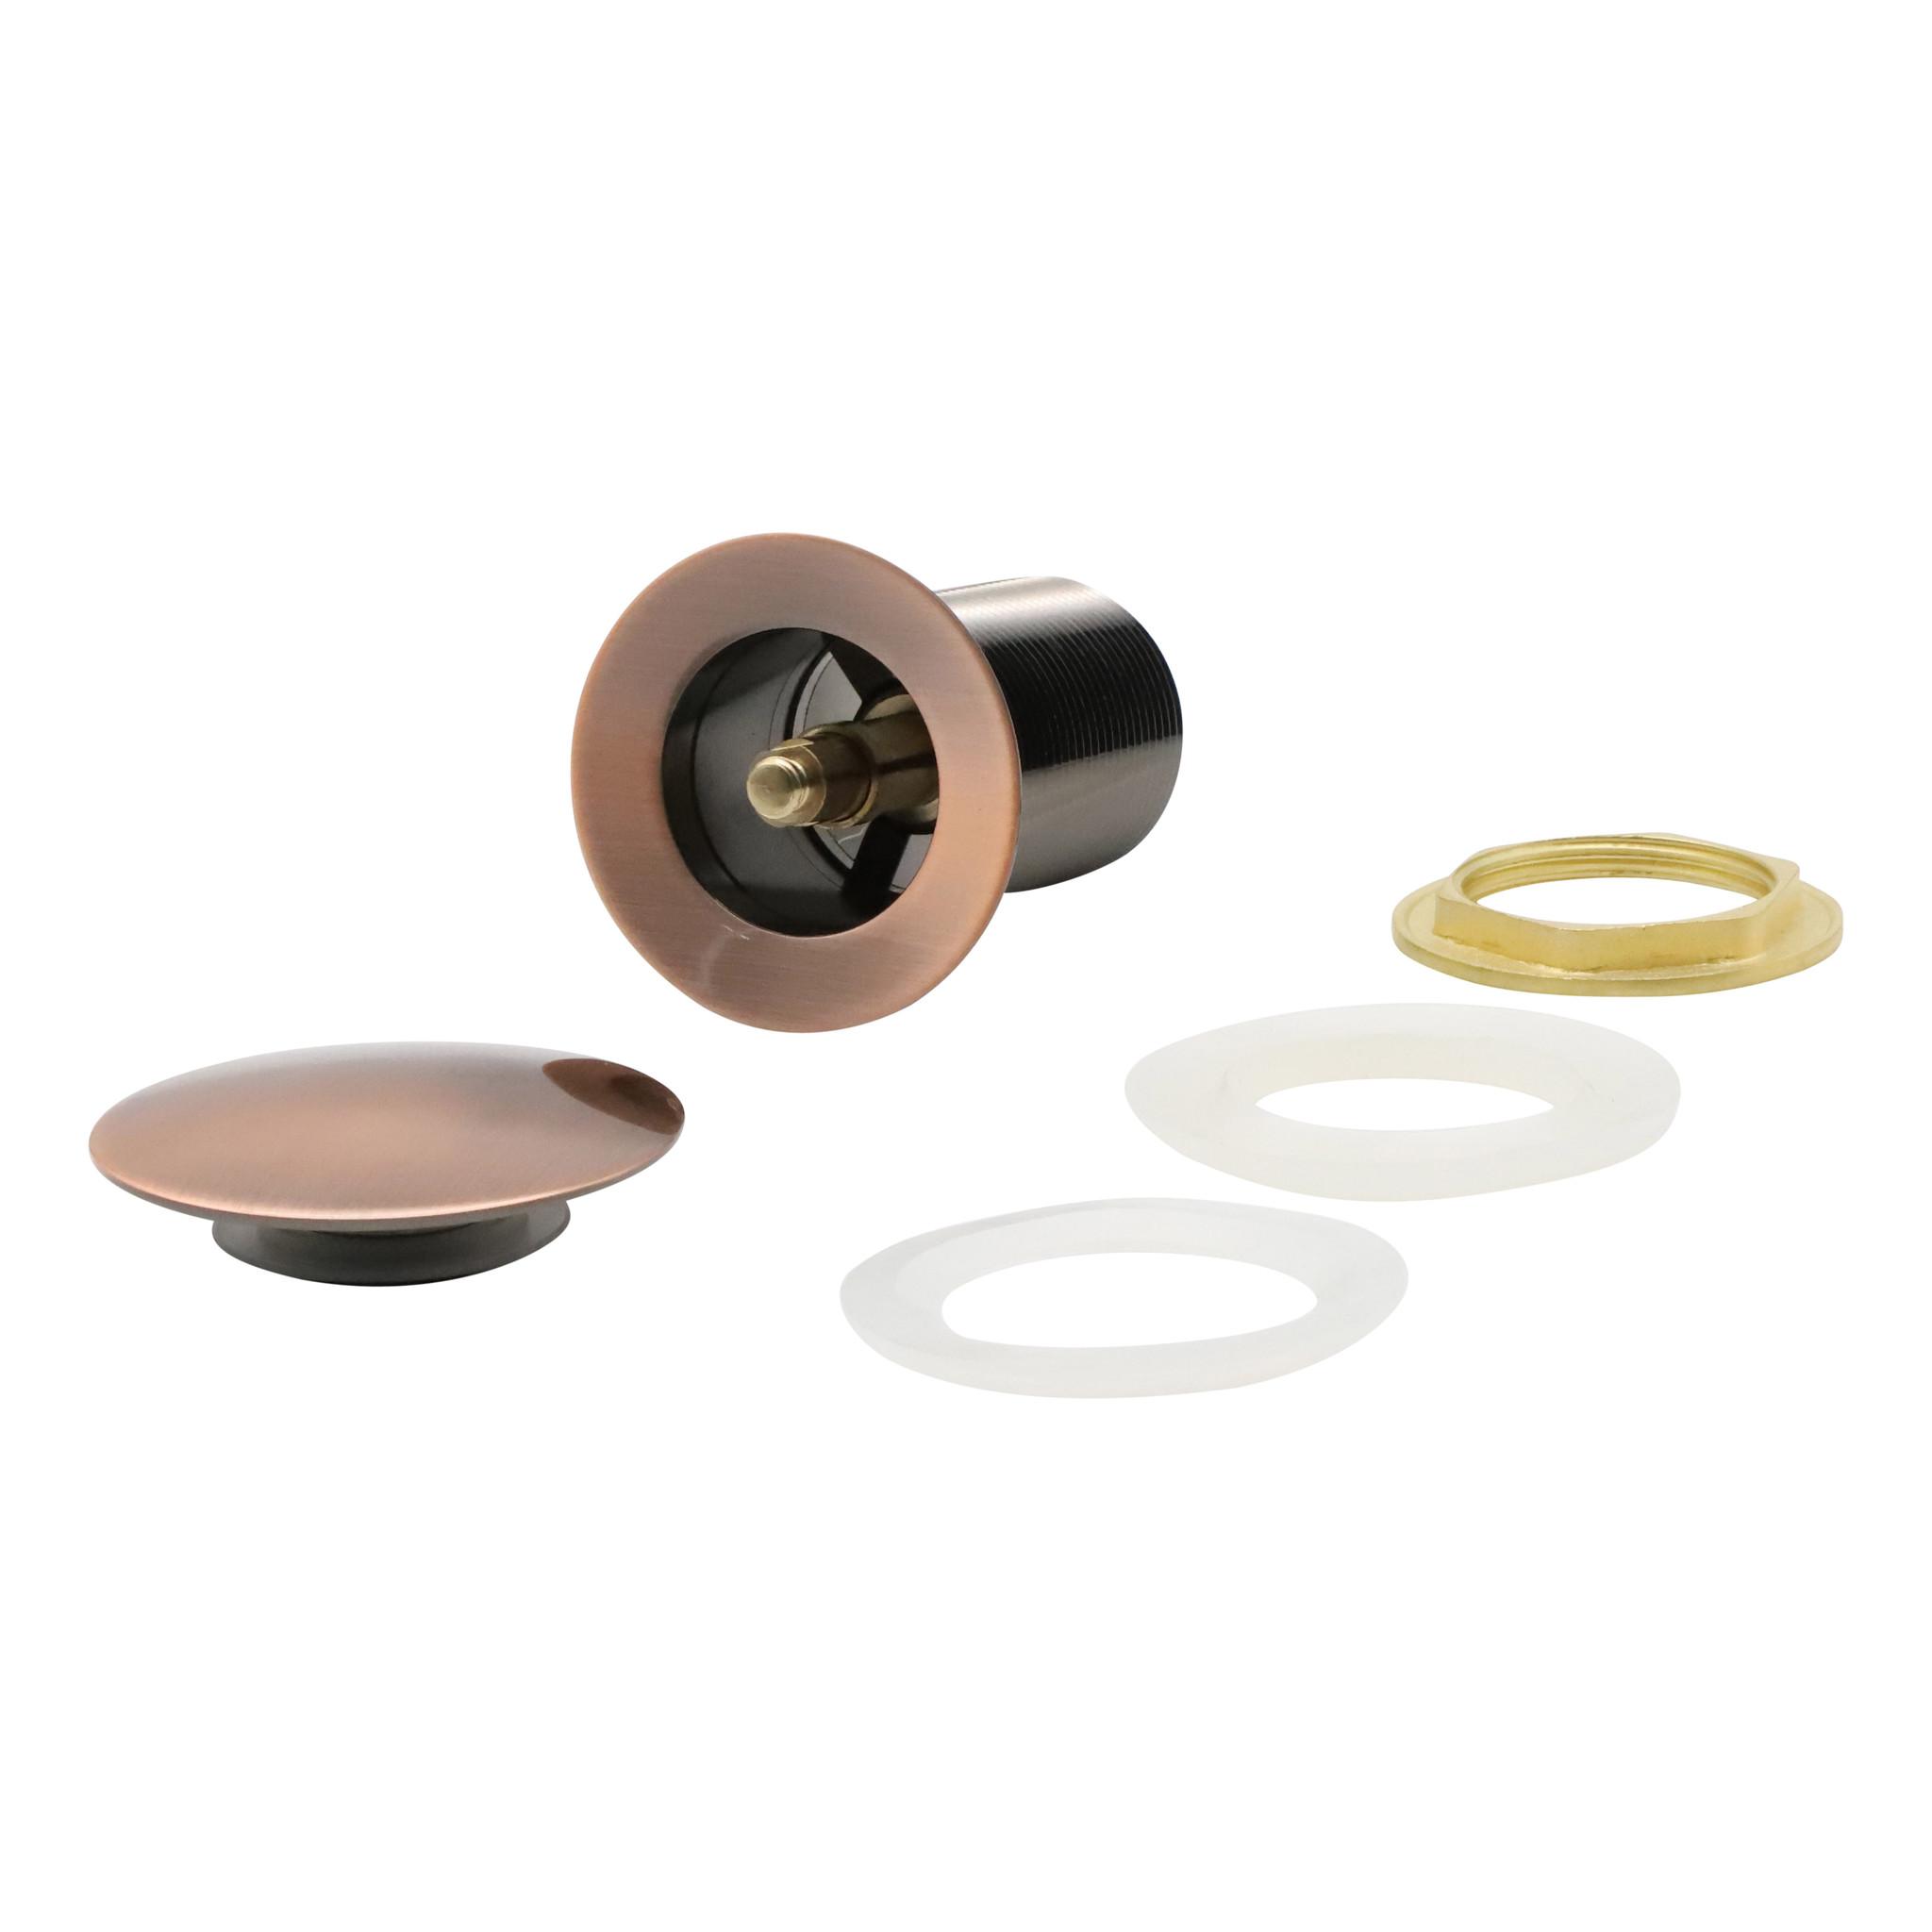 Indomarmer Pop-up Drain Plug with Long Shaft 9 cm Bronze